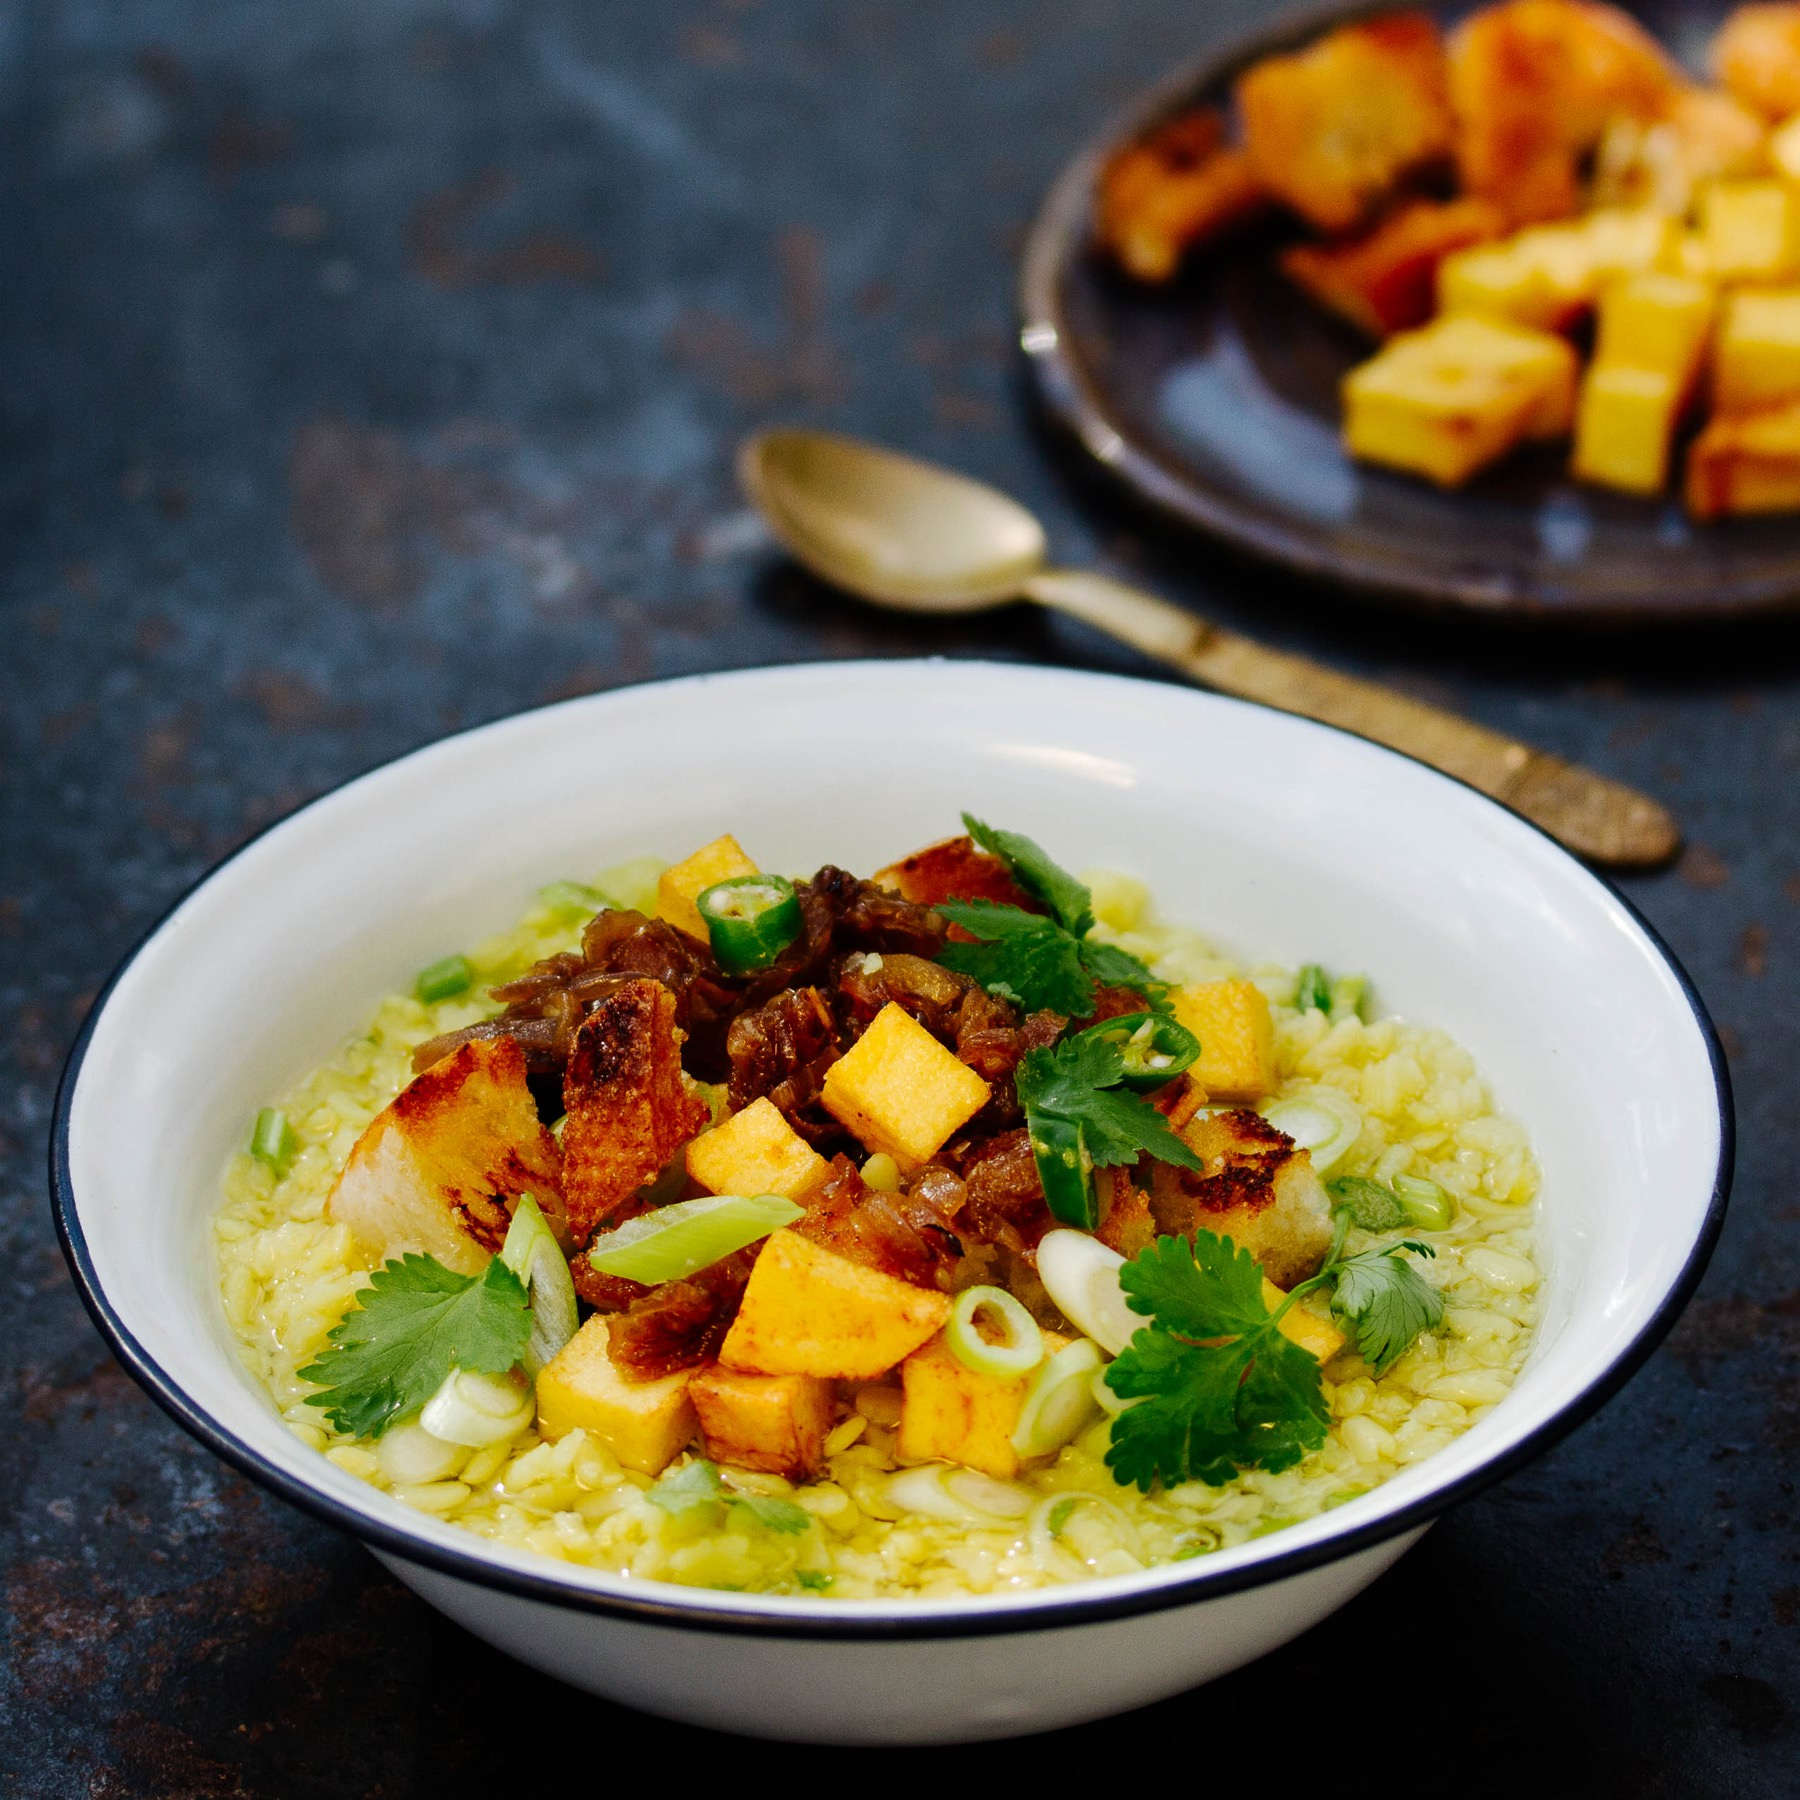 Burmesische Suppe aus roten Linsen - Penily Hincho